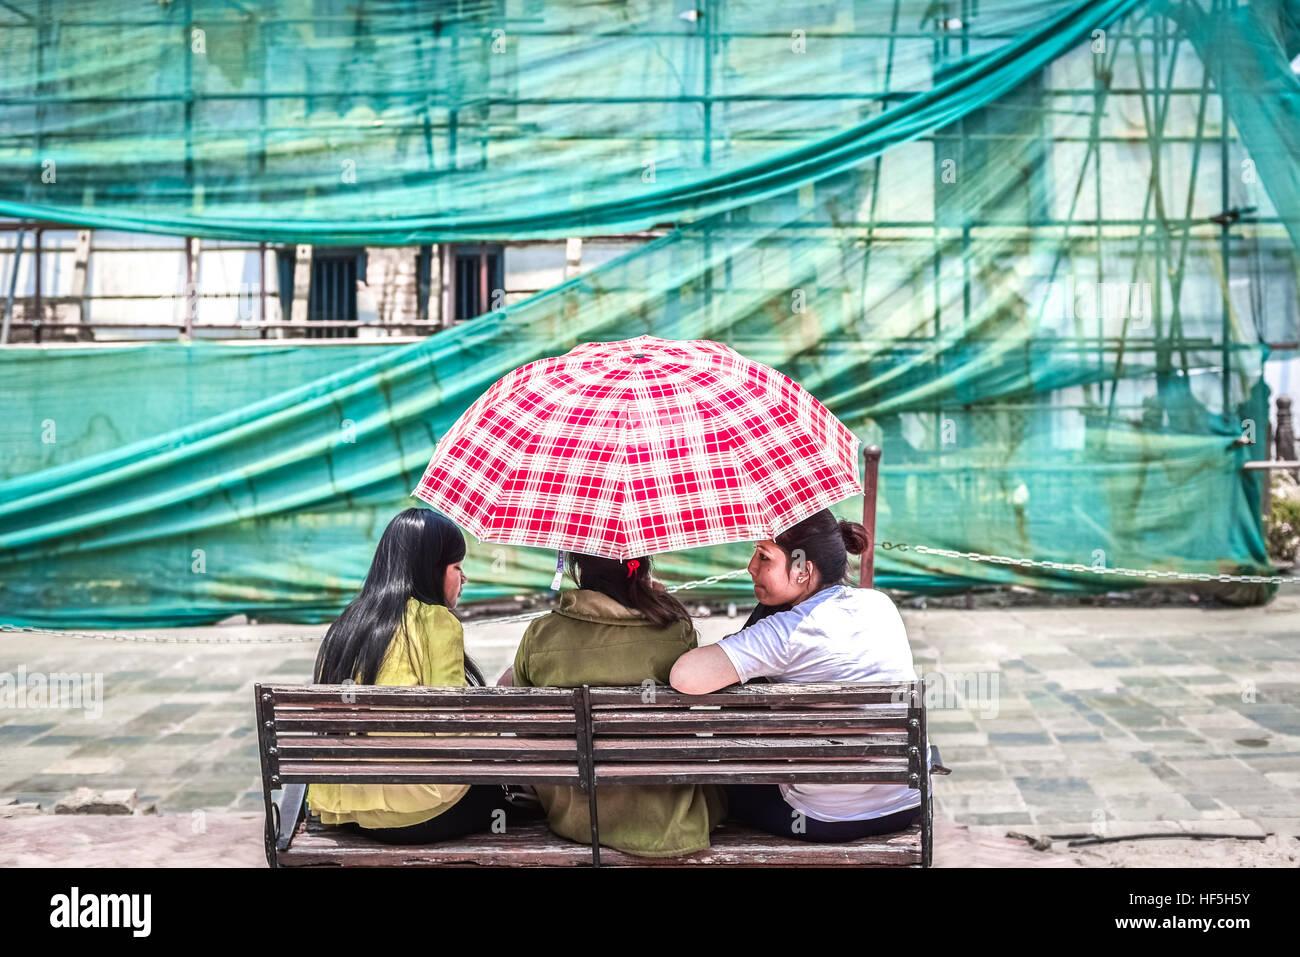 Three young women sharing an umbrella on a bright day in Hanuman Dhoka, Durbar Square, Kathmandu. © Reynold - Stock Image